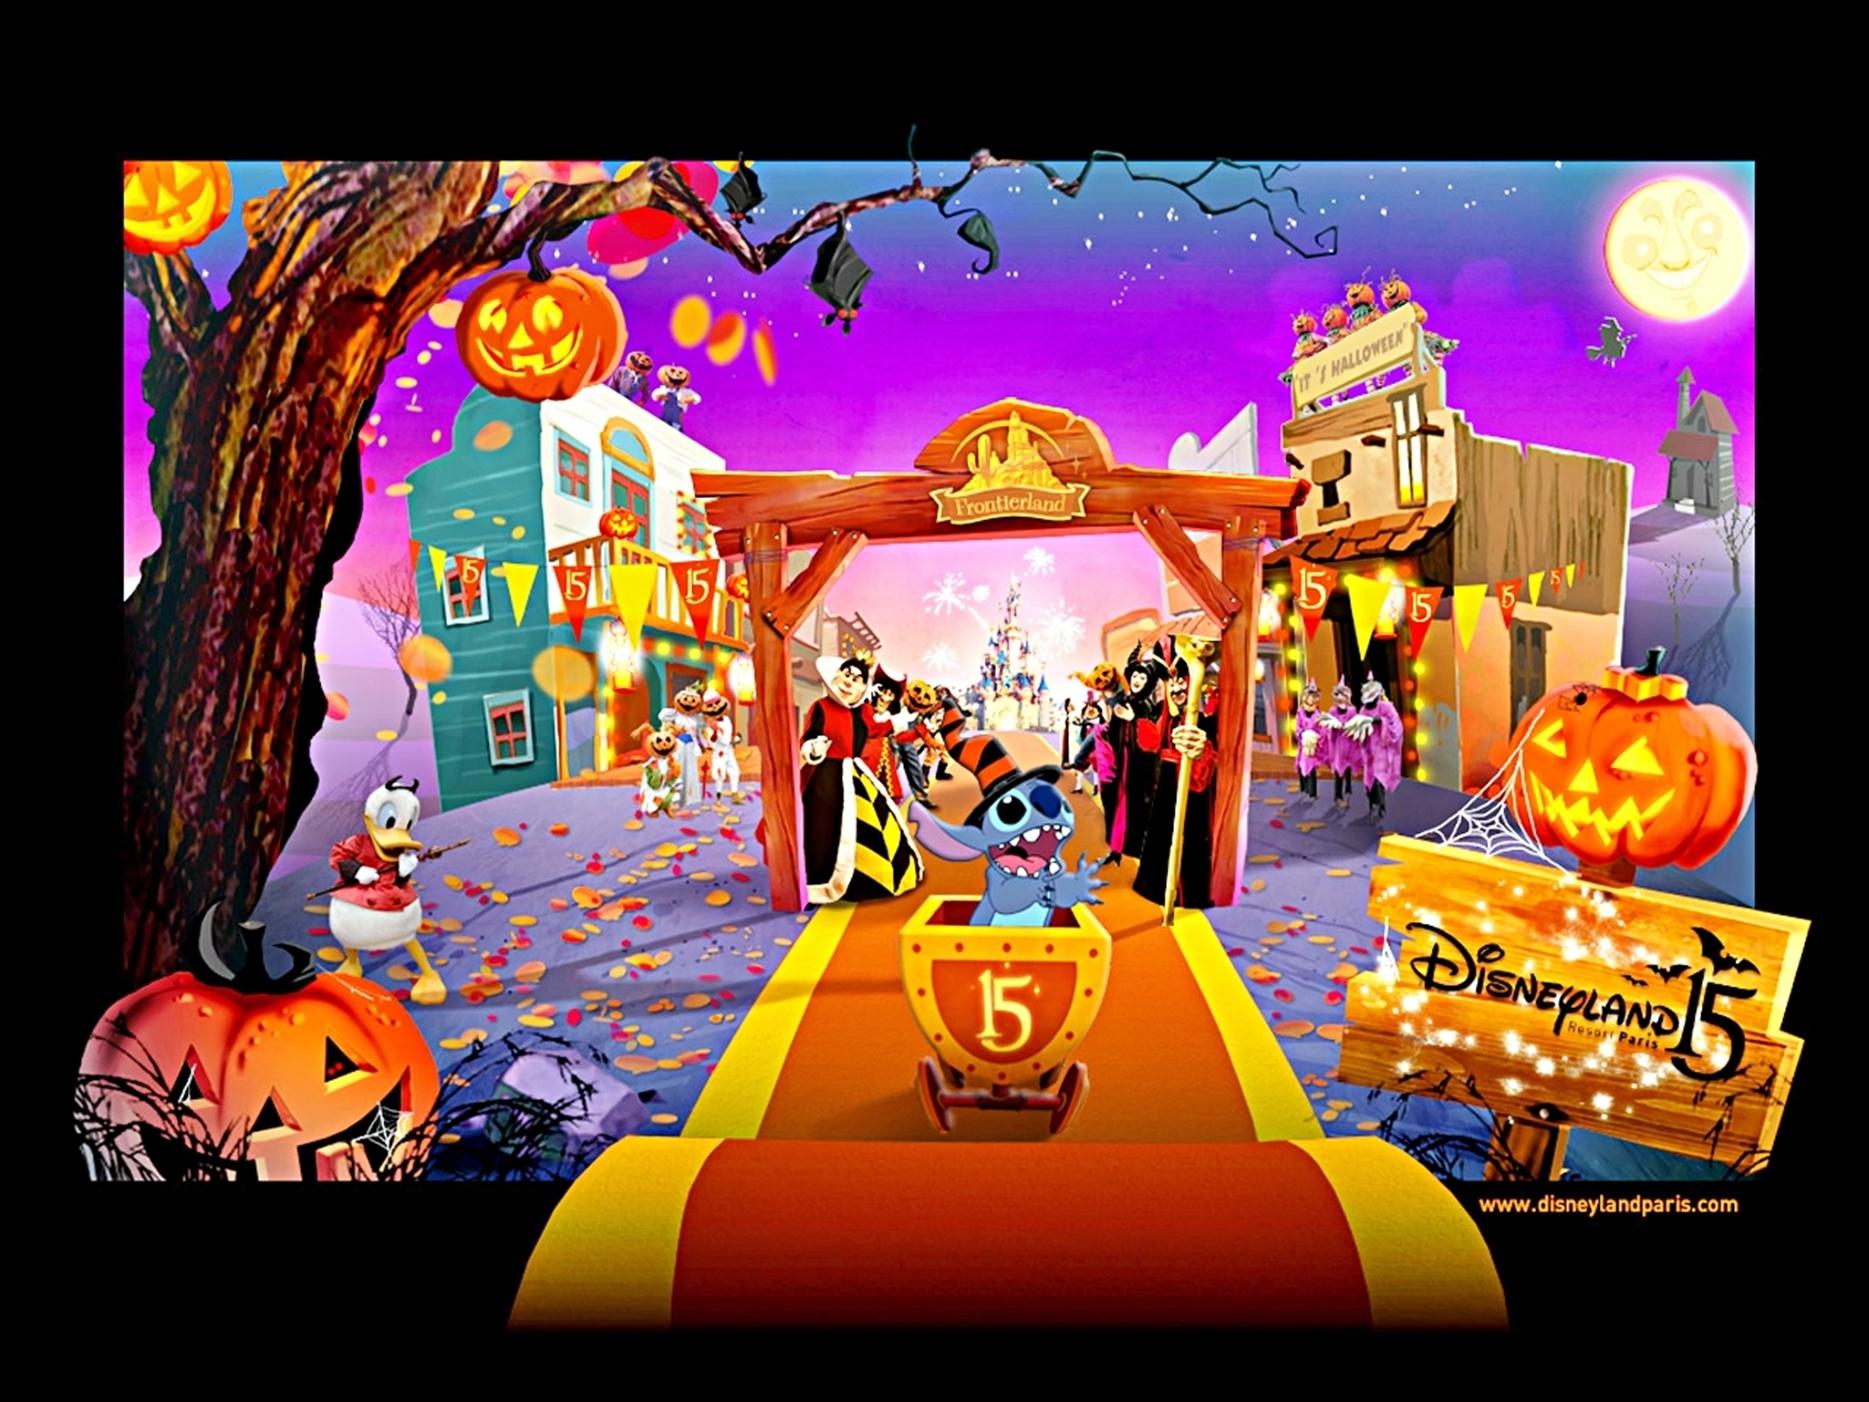 walt disney-figuren bilder walt disney hintergründe - halloween